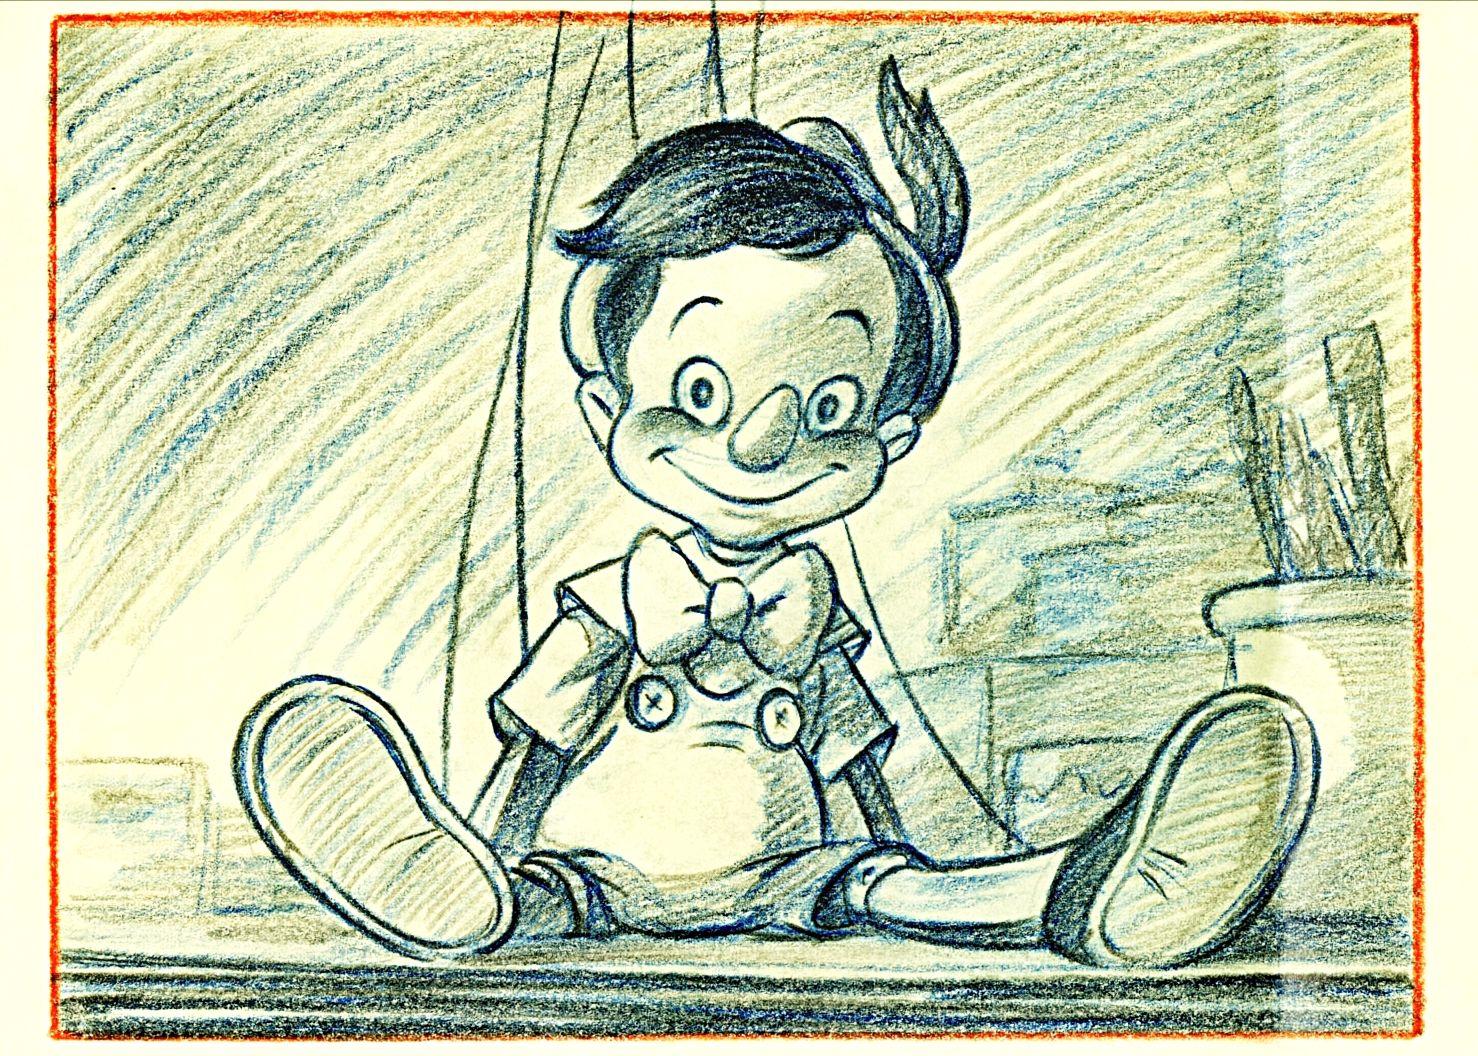 disney sketches - Google Search